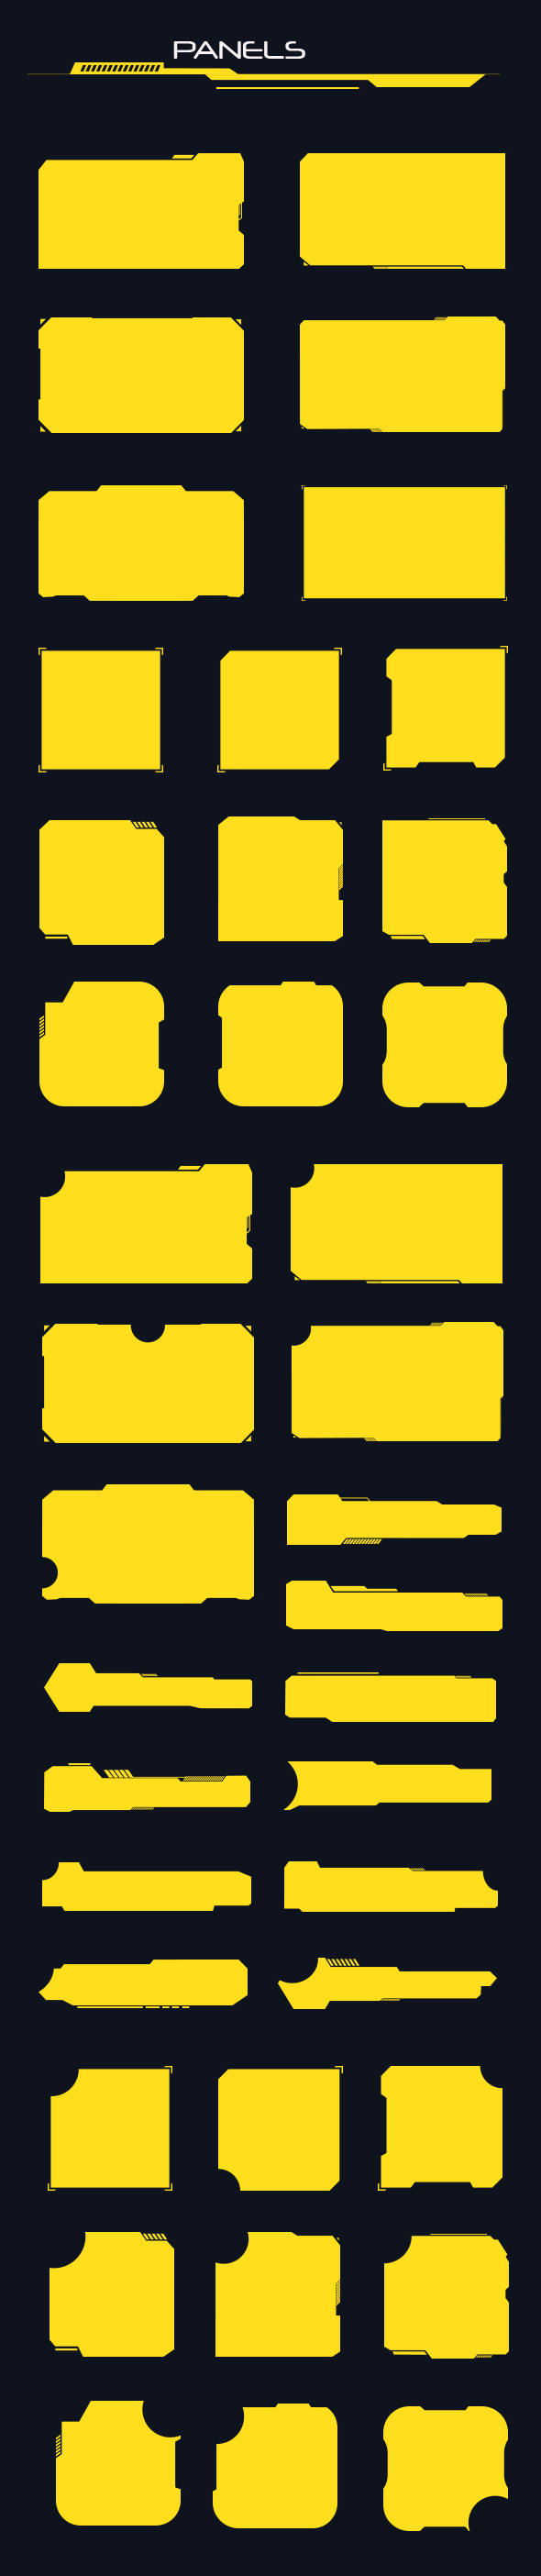 GraphicRiver 39 Hi-tech Panels Custom Shapes 20461064